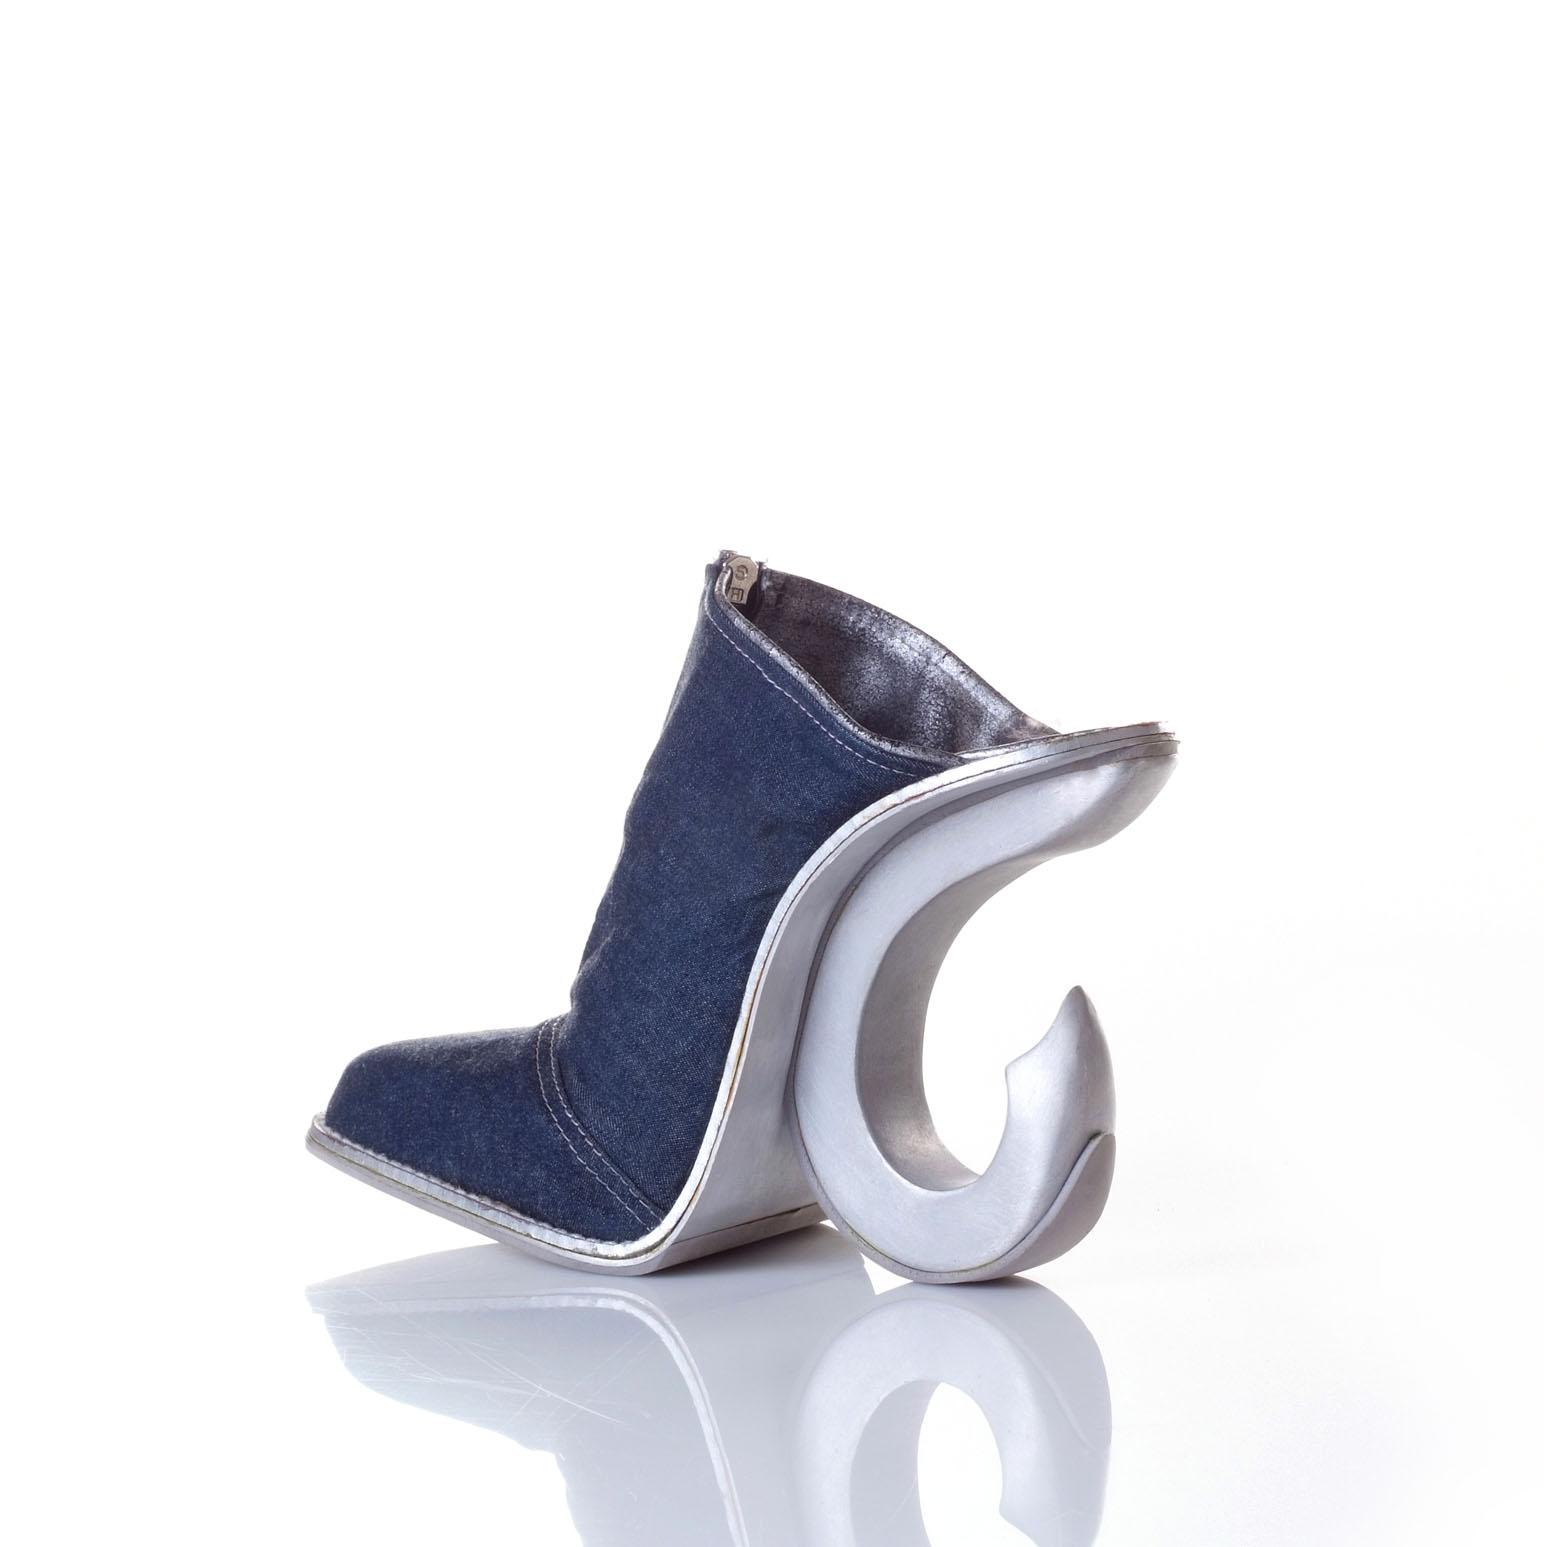 aluminumb31 Artistic Footwear Designs by Kobi Levi